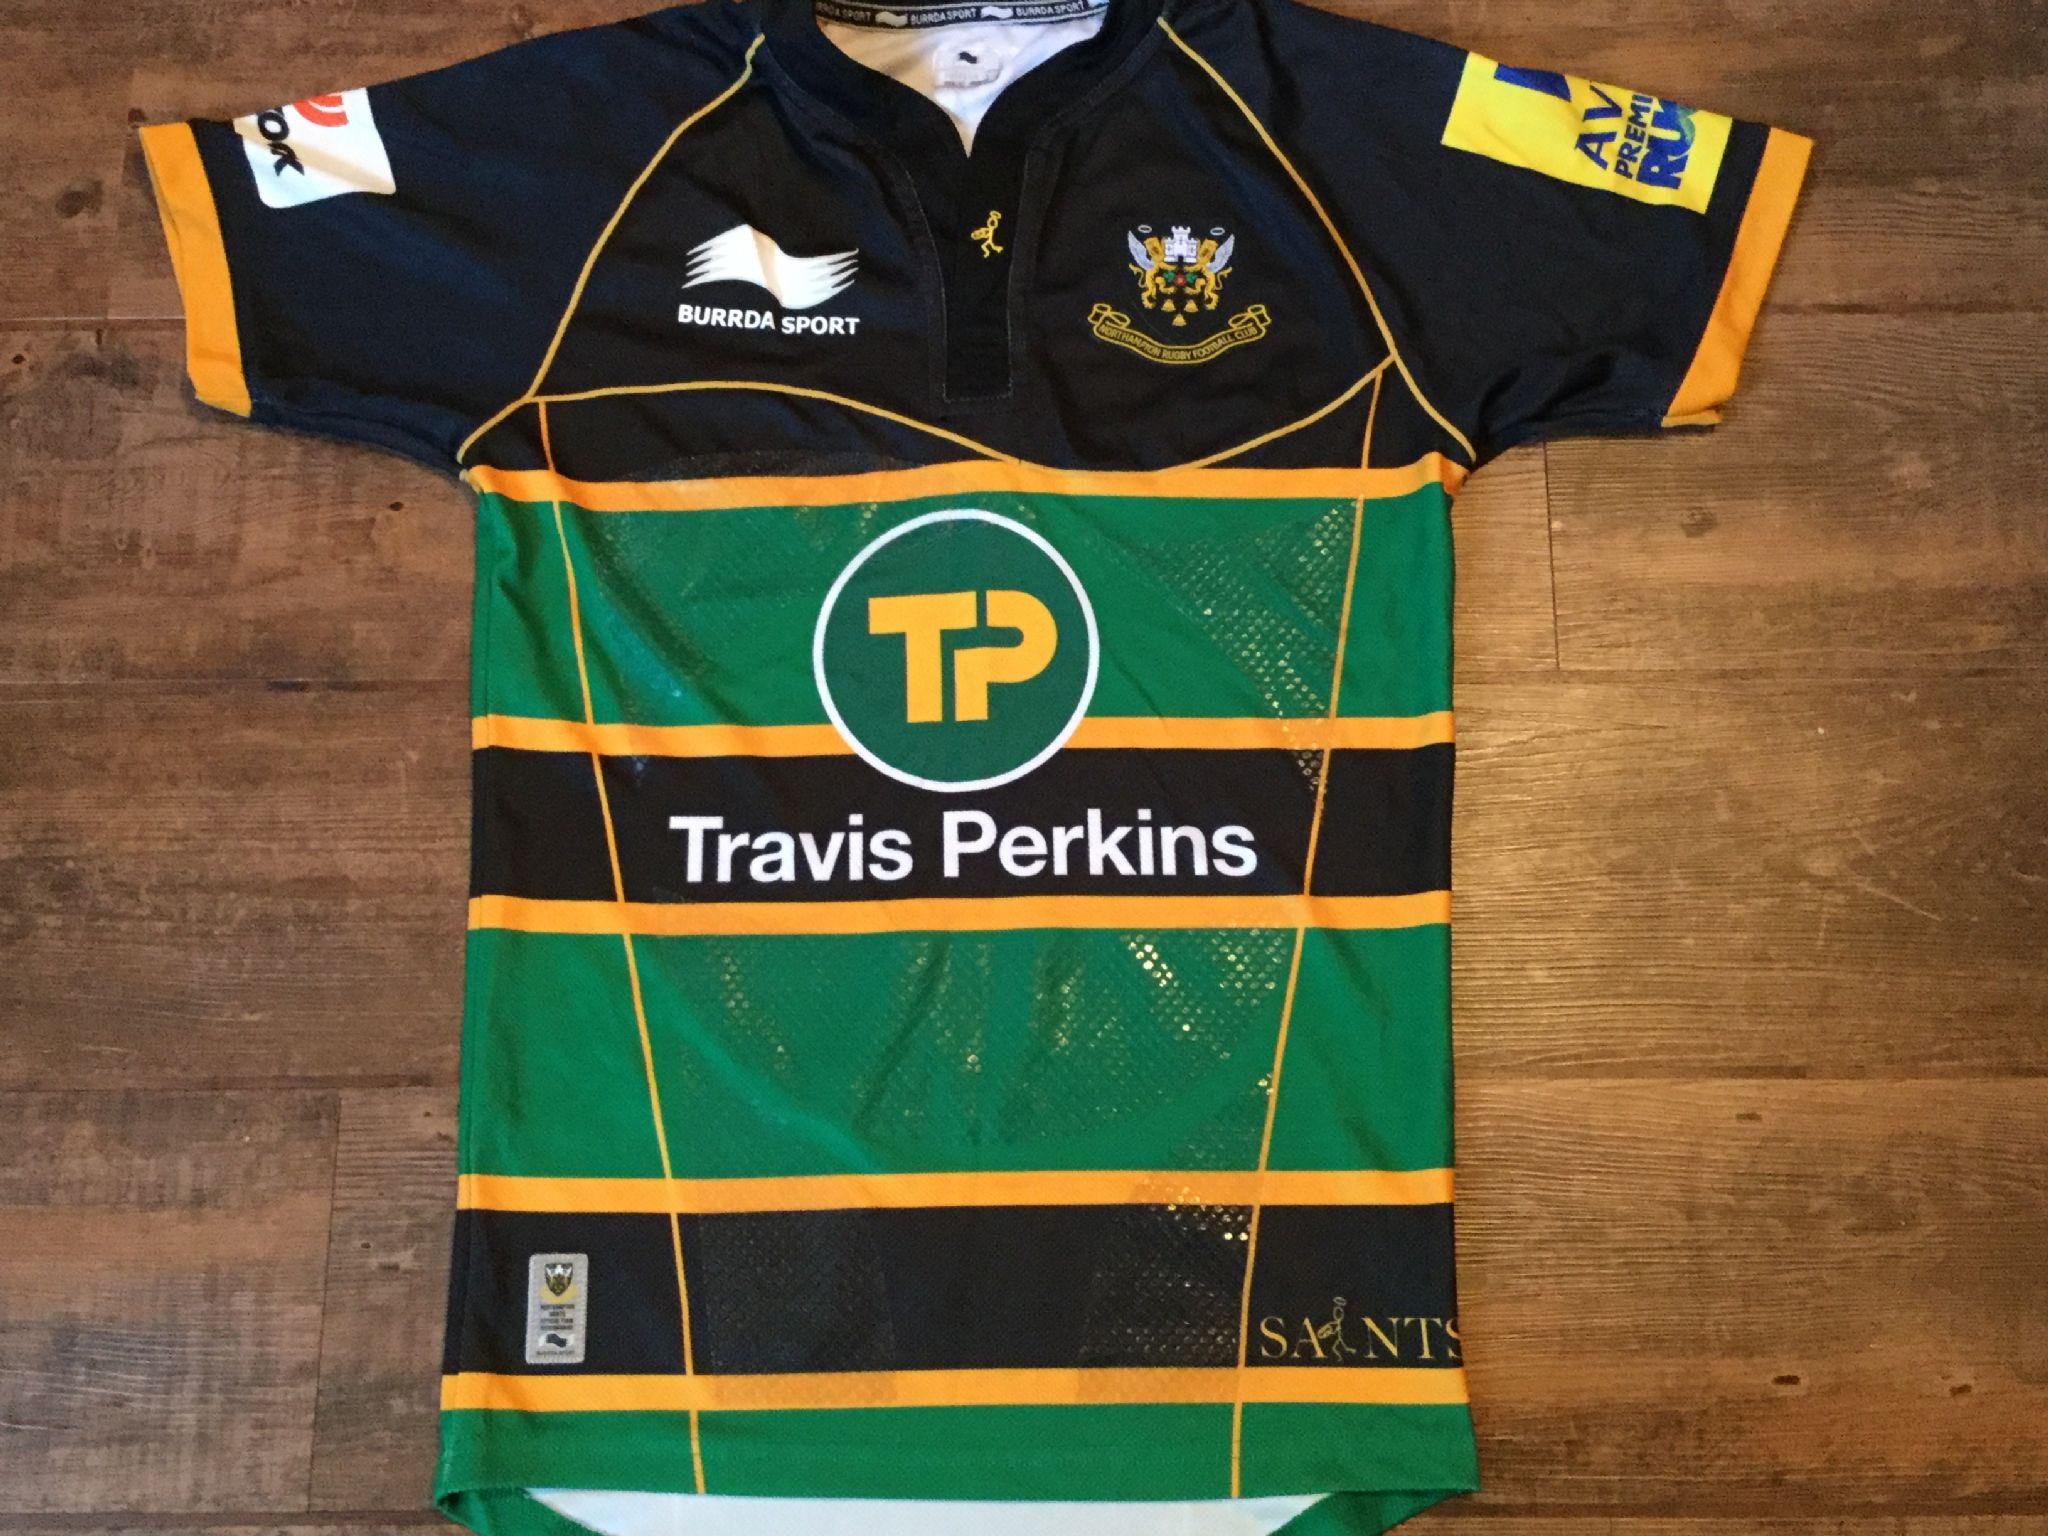 2013 2014 Northampton Pro Rugby Union Home Shirt Saints Adults Large